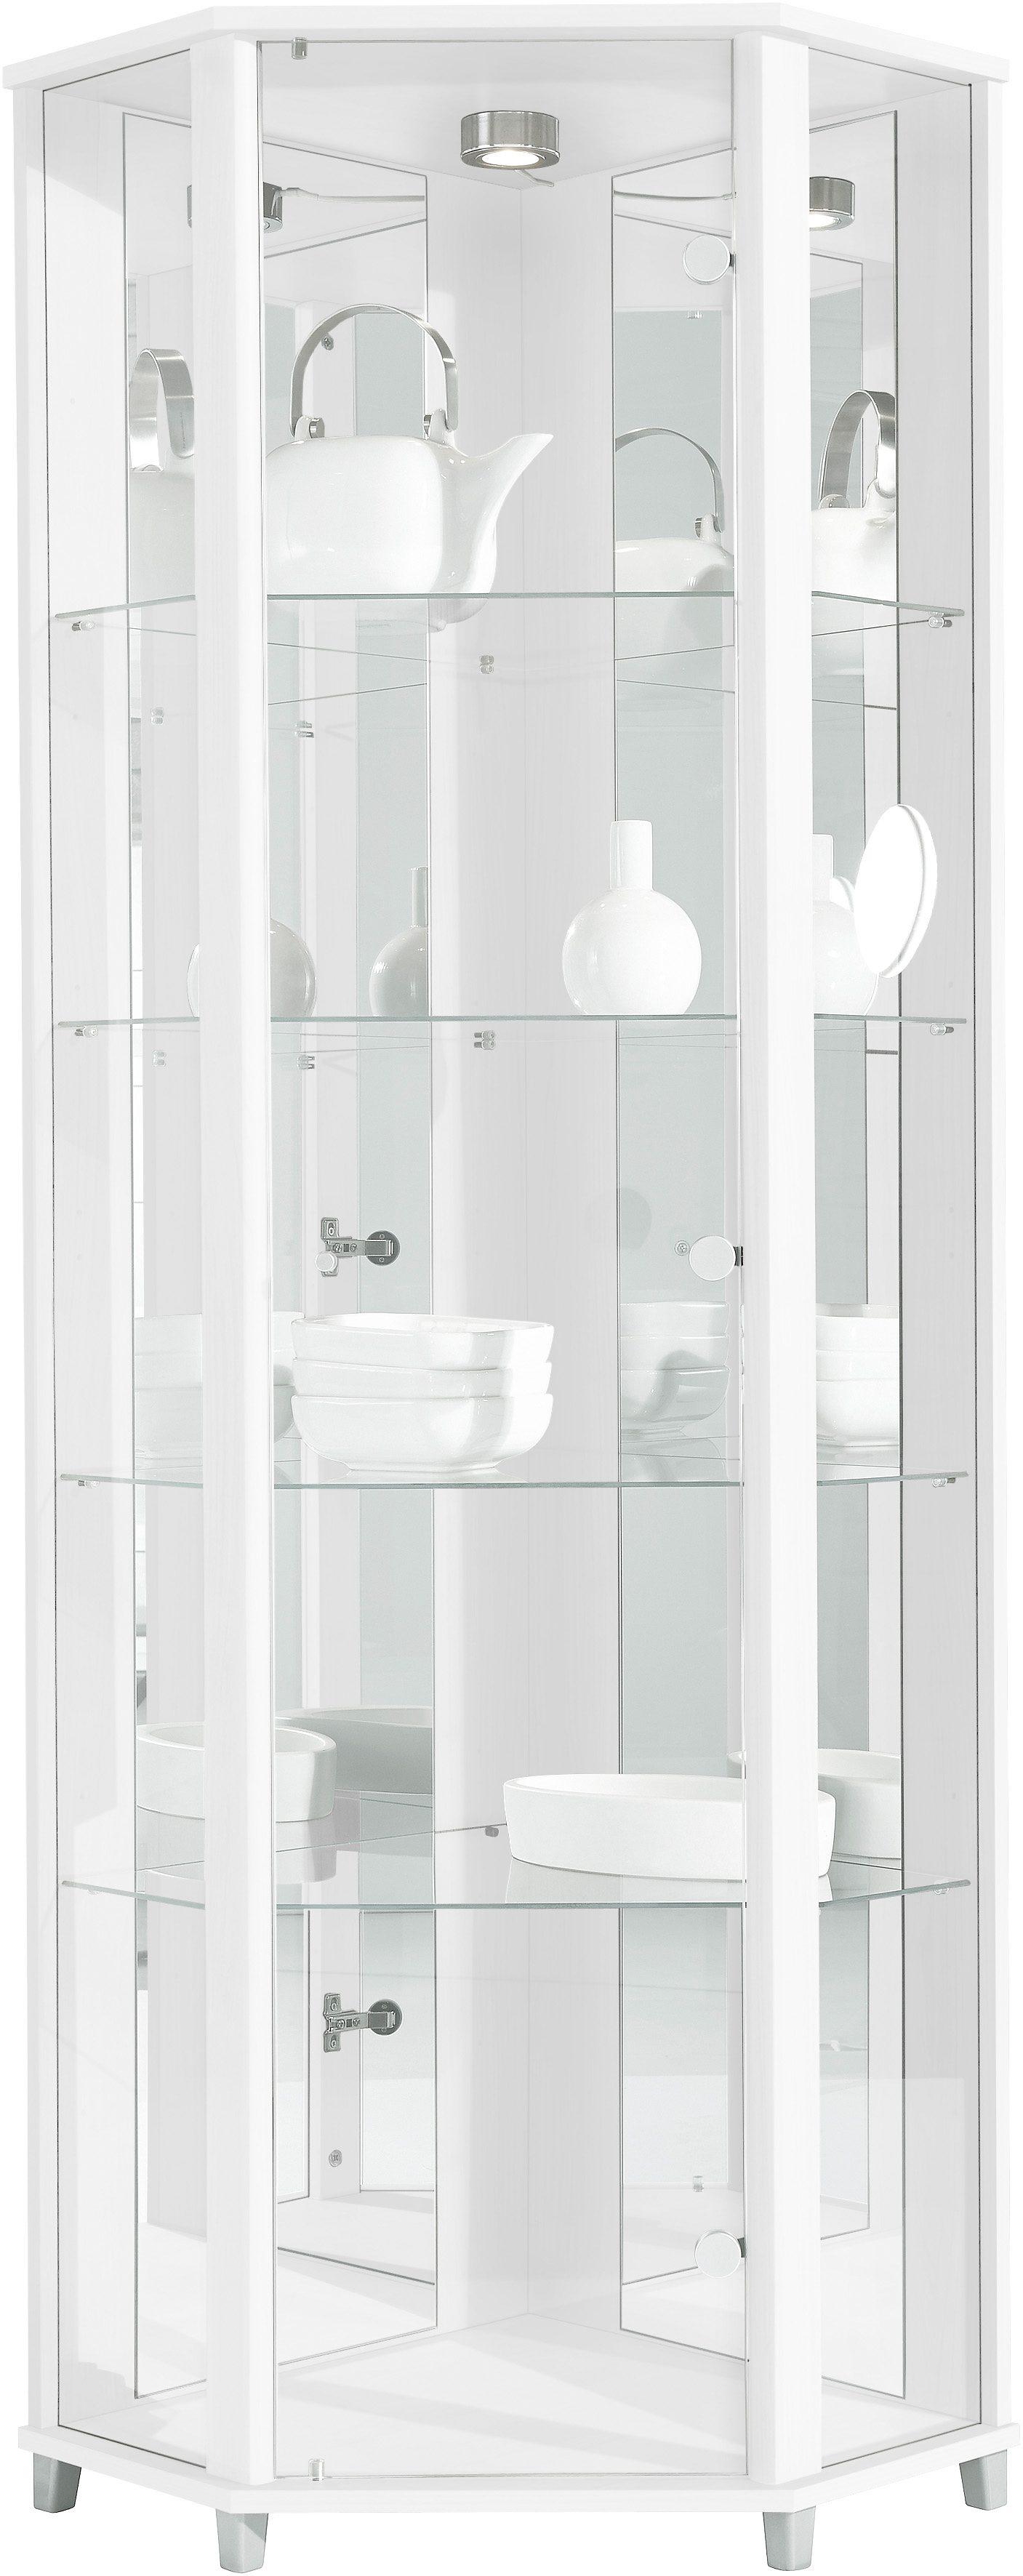 Eckvitrine, Höhe 172 cm, 4 Glasböden | Wohnzimmer > Vitrinen > Eckvitrinen | Weiß | Melamin | QUELLE